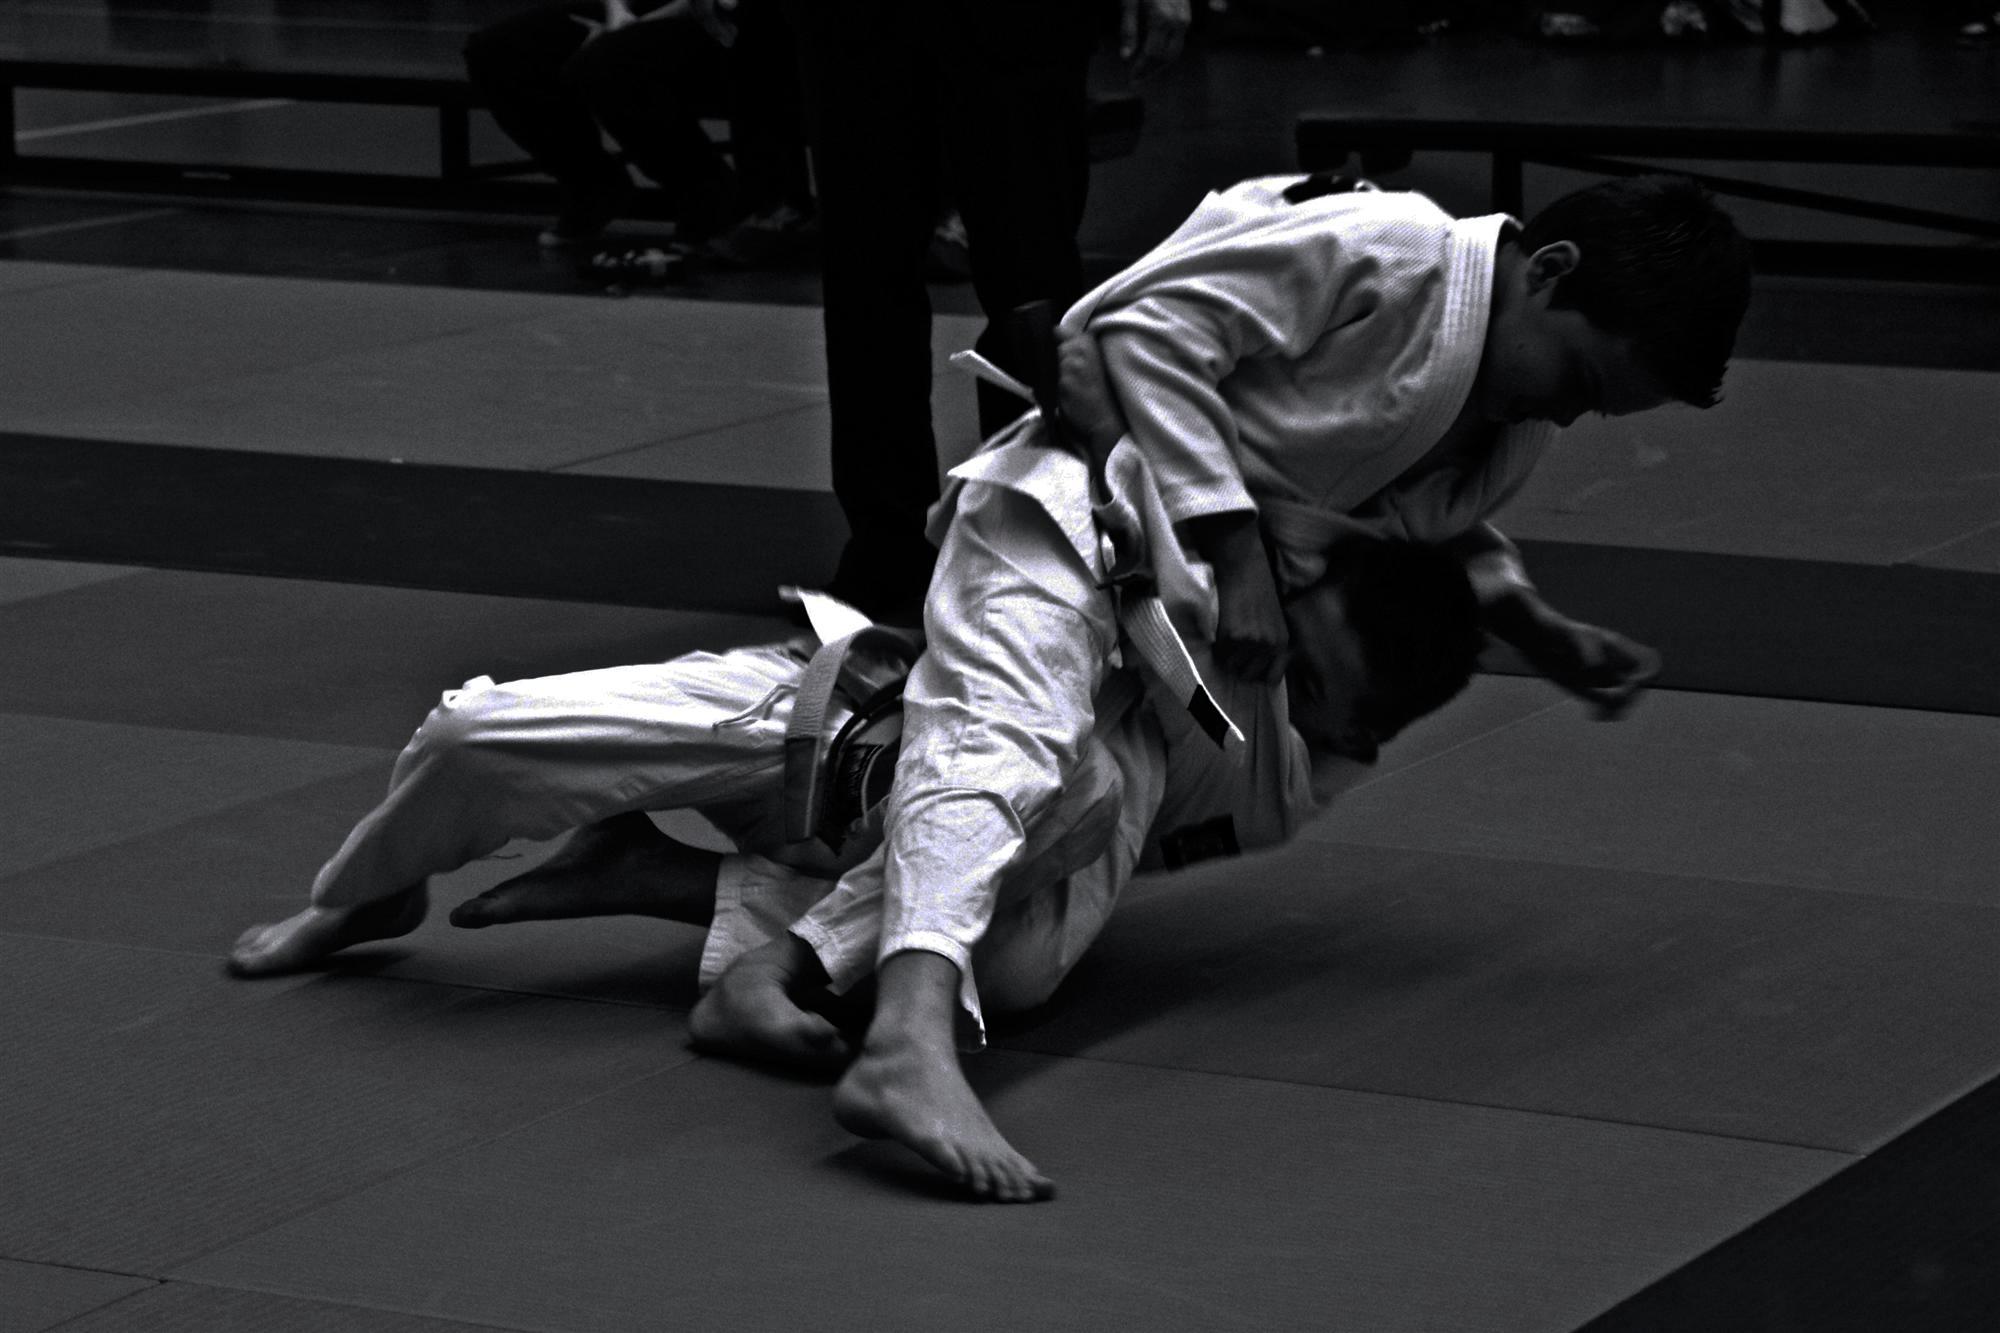 http://judoclubbrunssum.nl/iw-courses/techniek-trainingen/